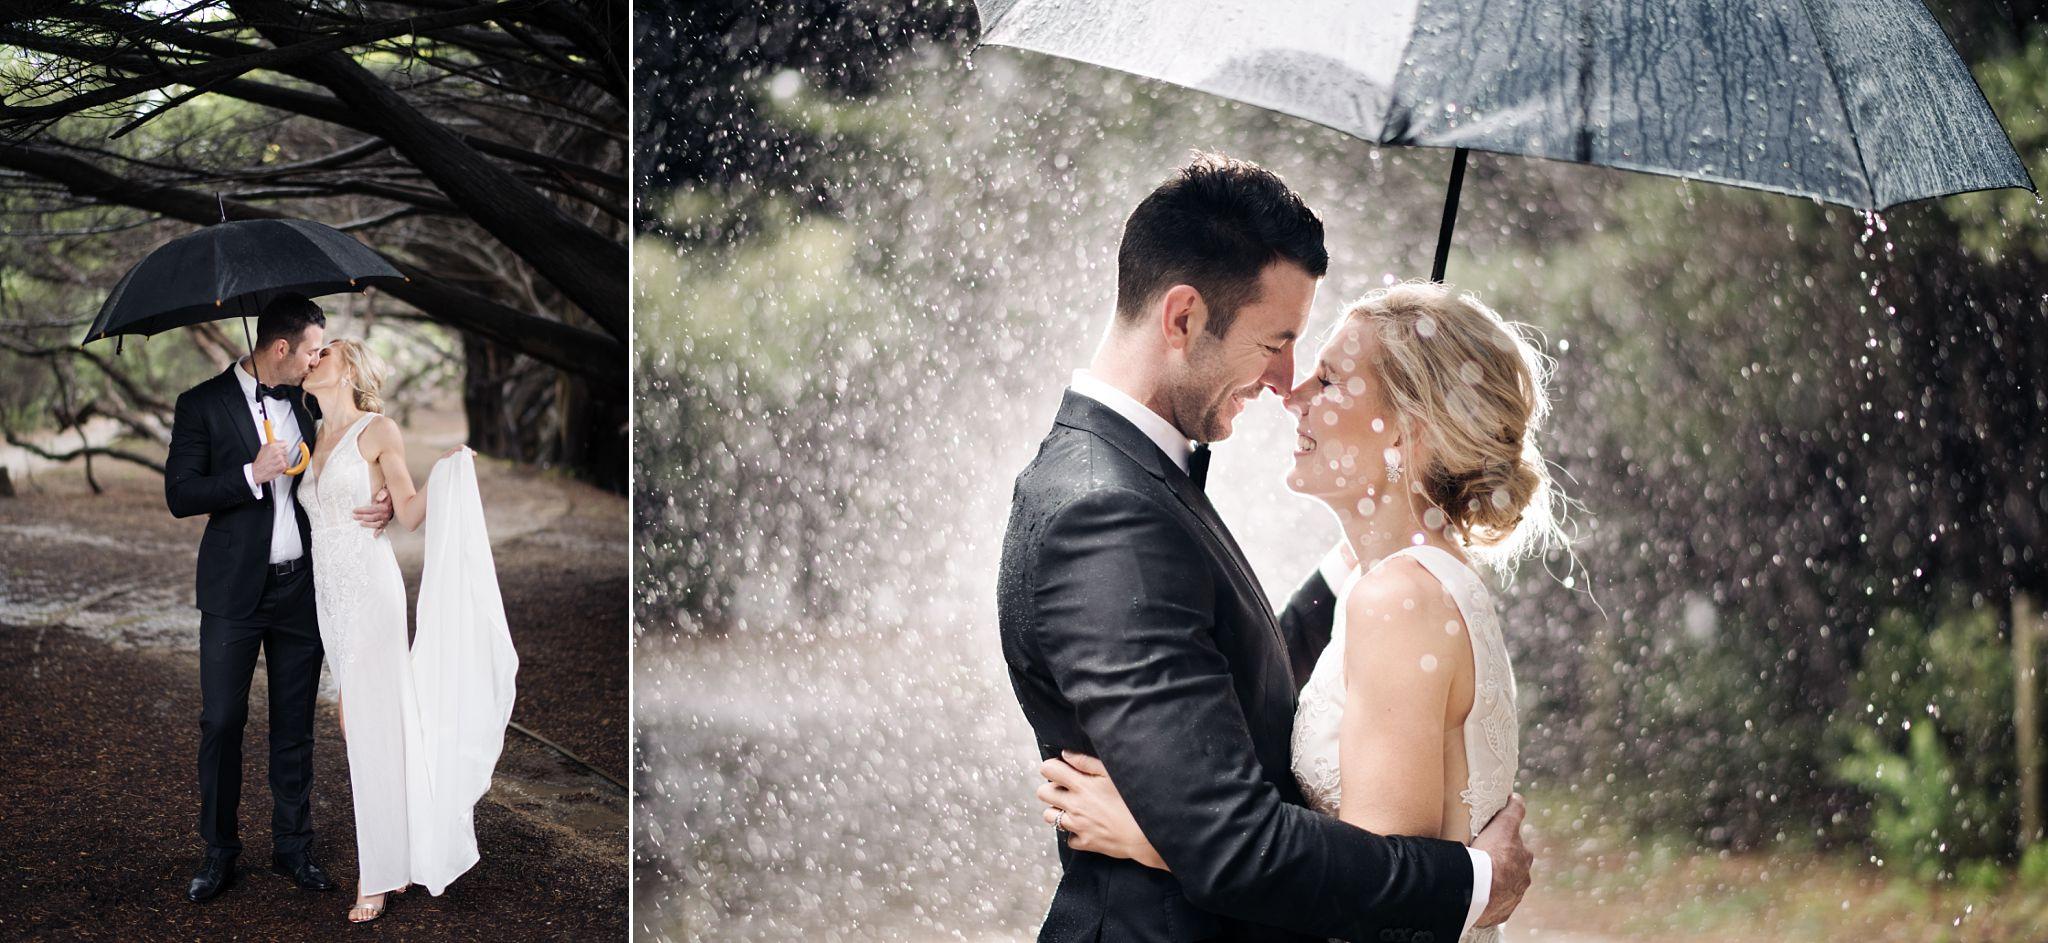 wedding-photography-lorne_0027.jpg